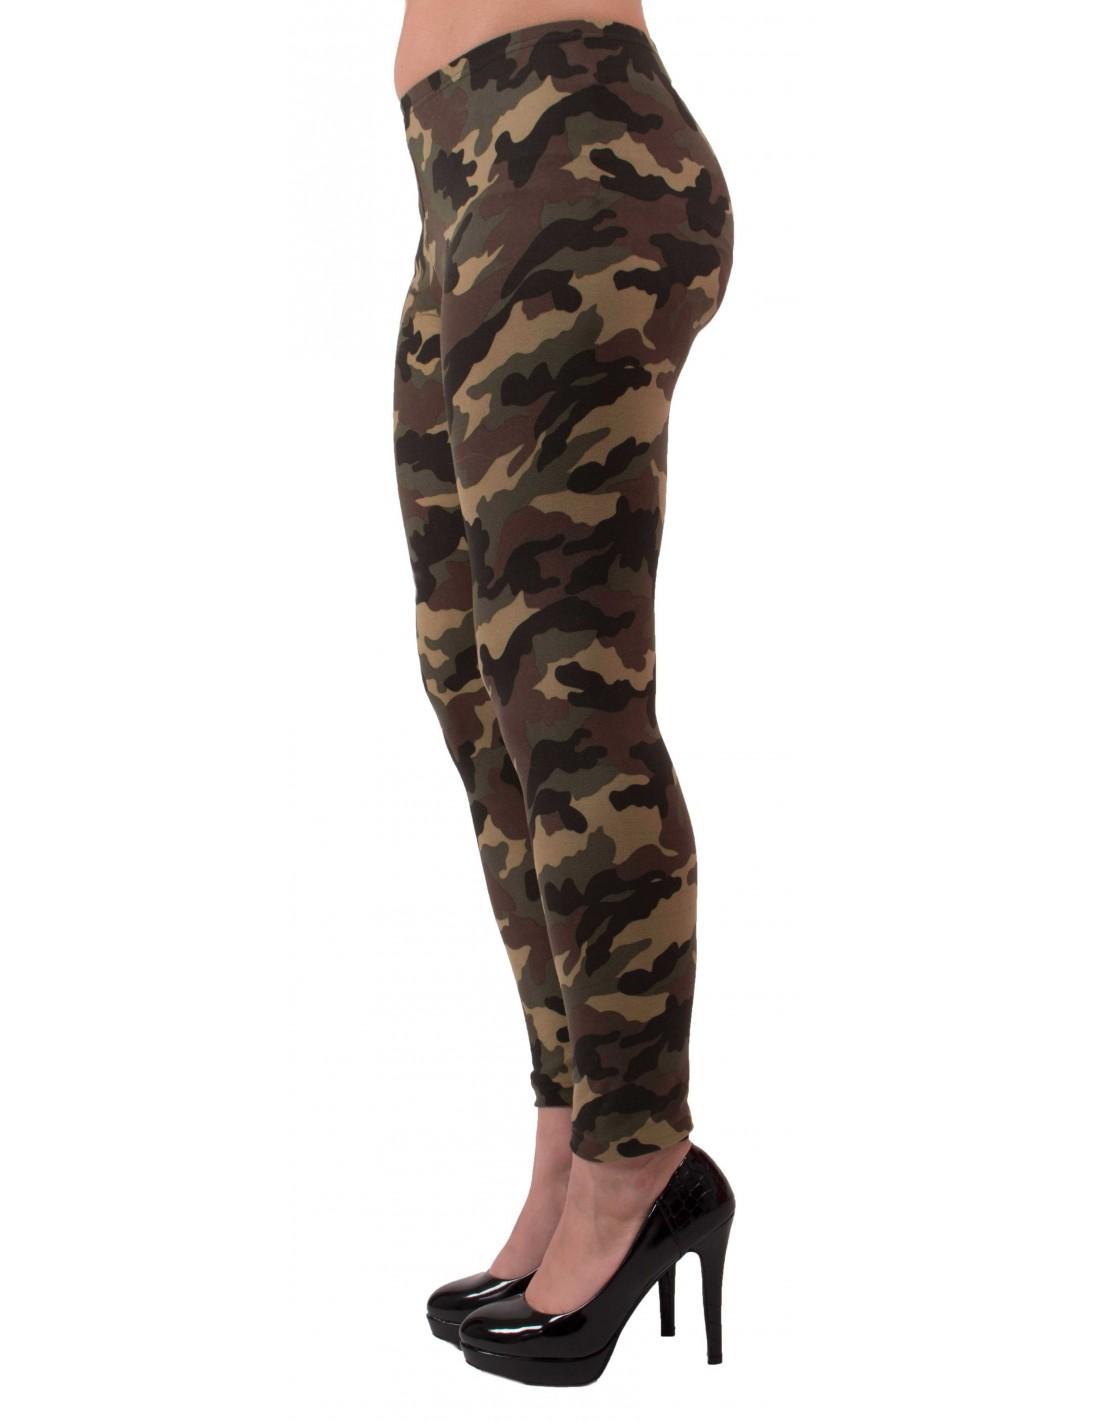 Legging militaire femme kaki caleçon camouflage